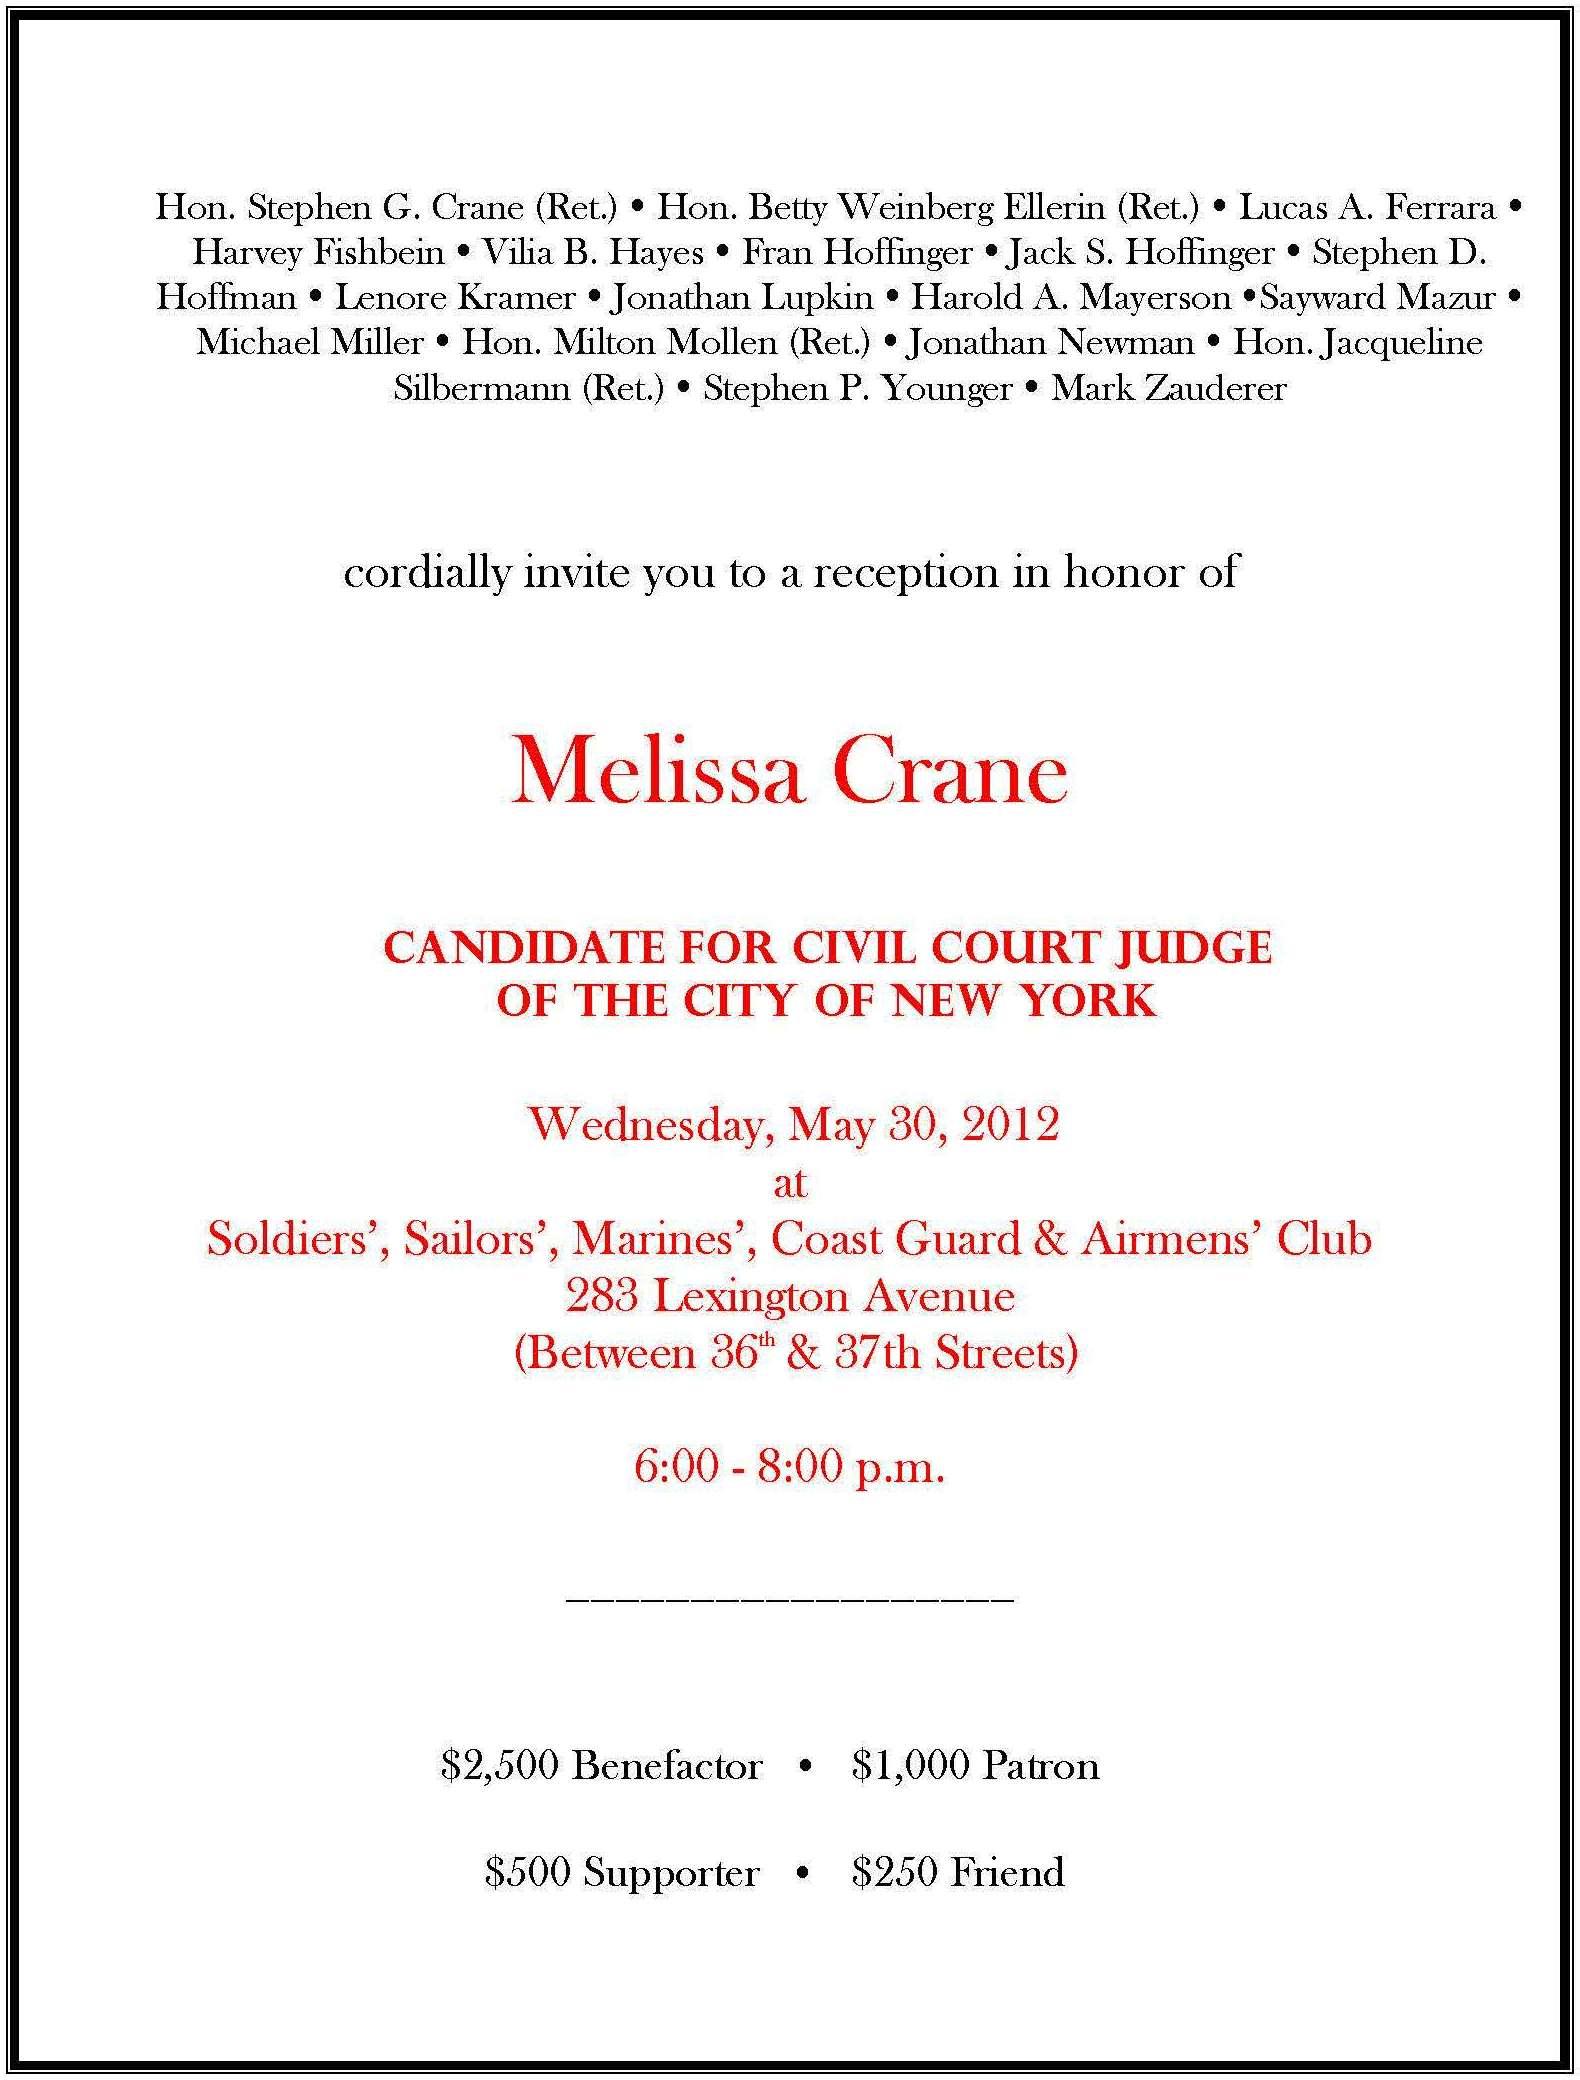 Crane_Invitation_053012.jpg